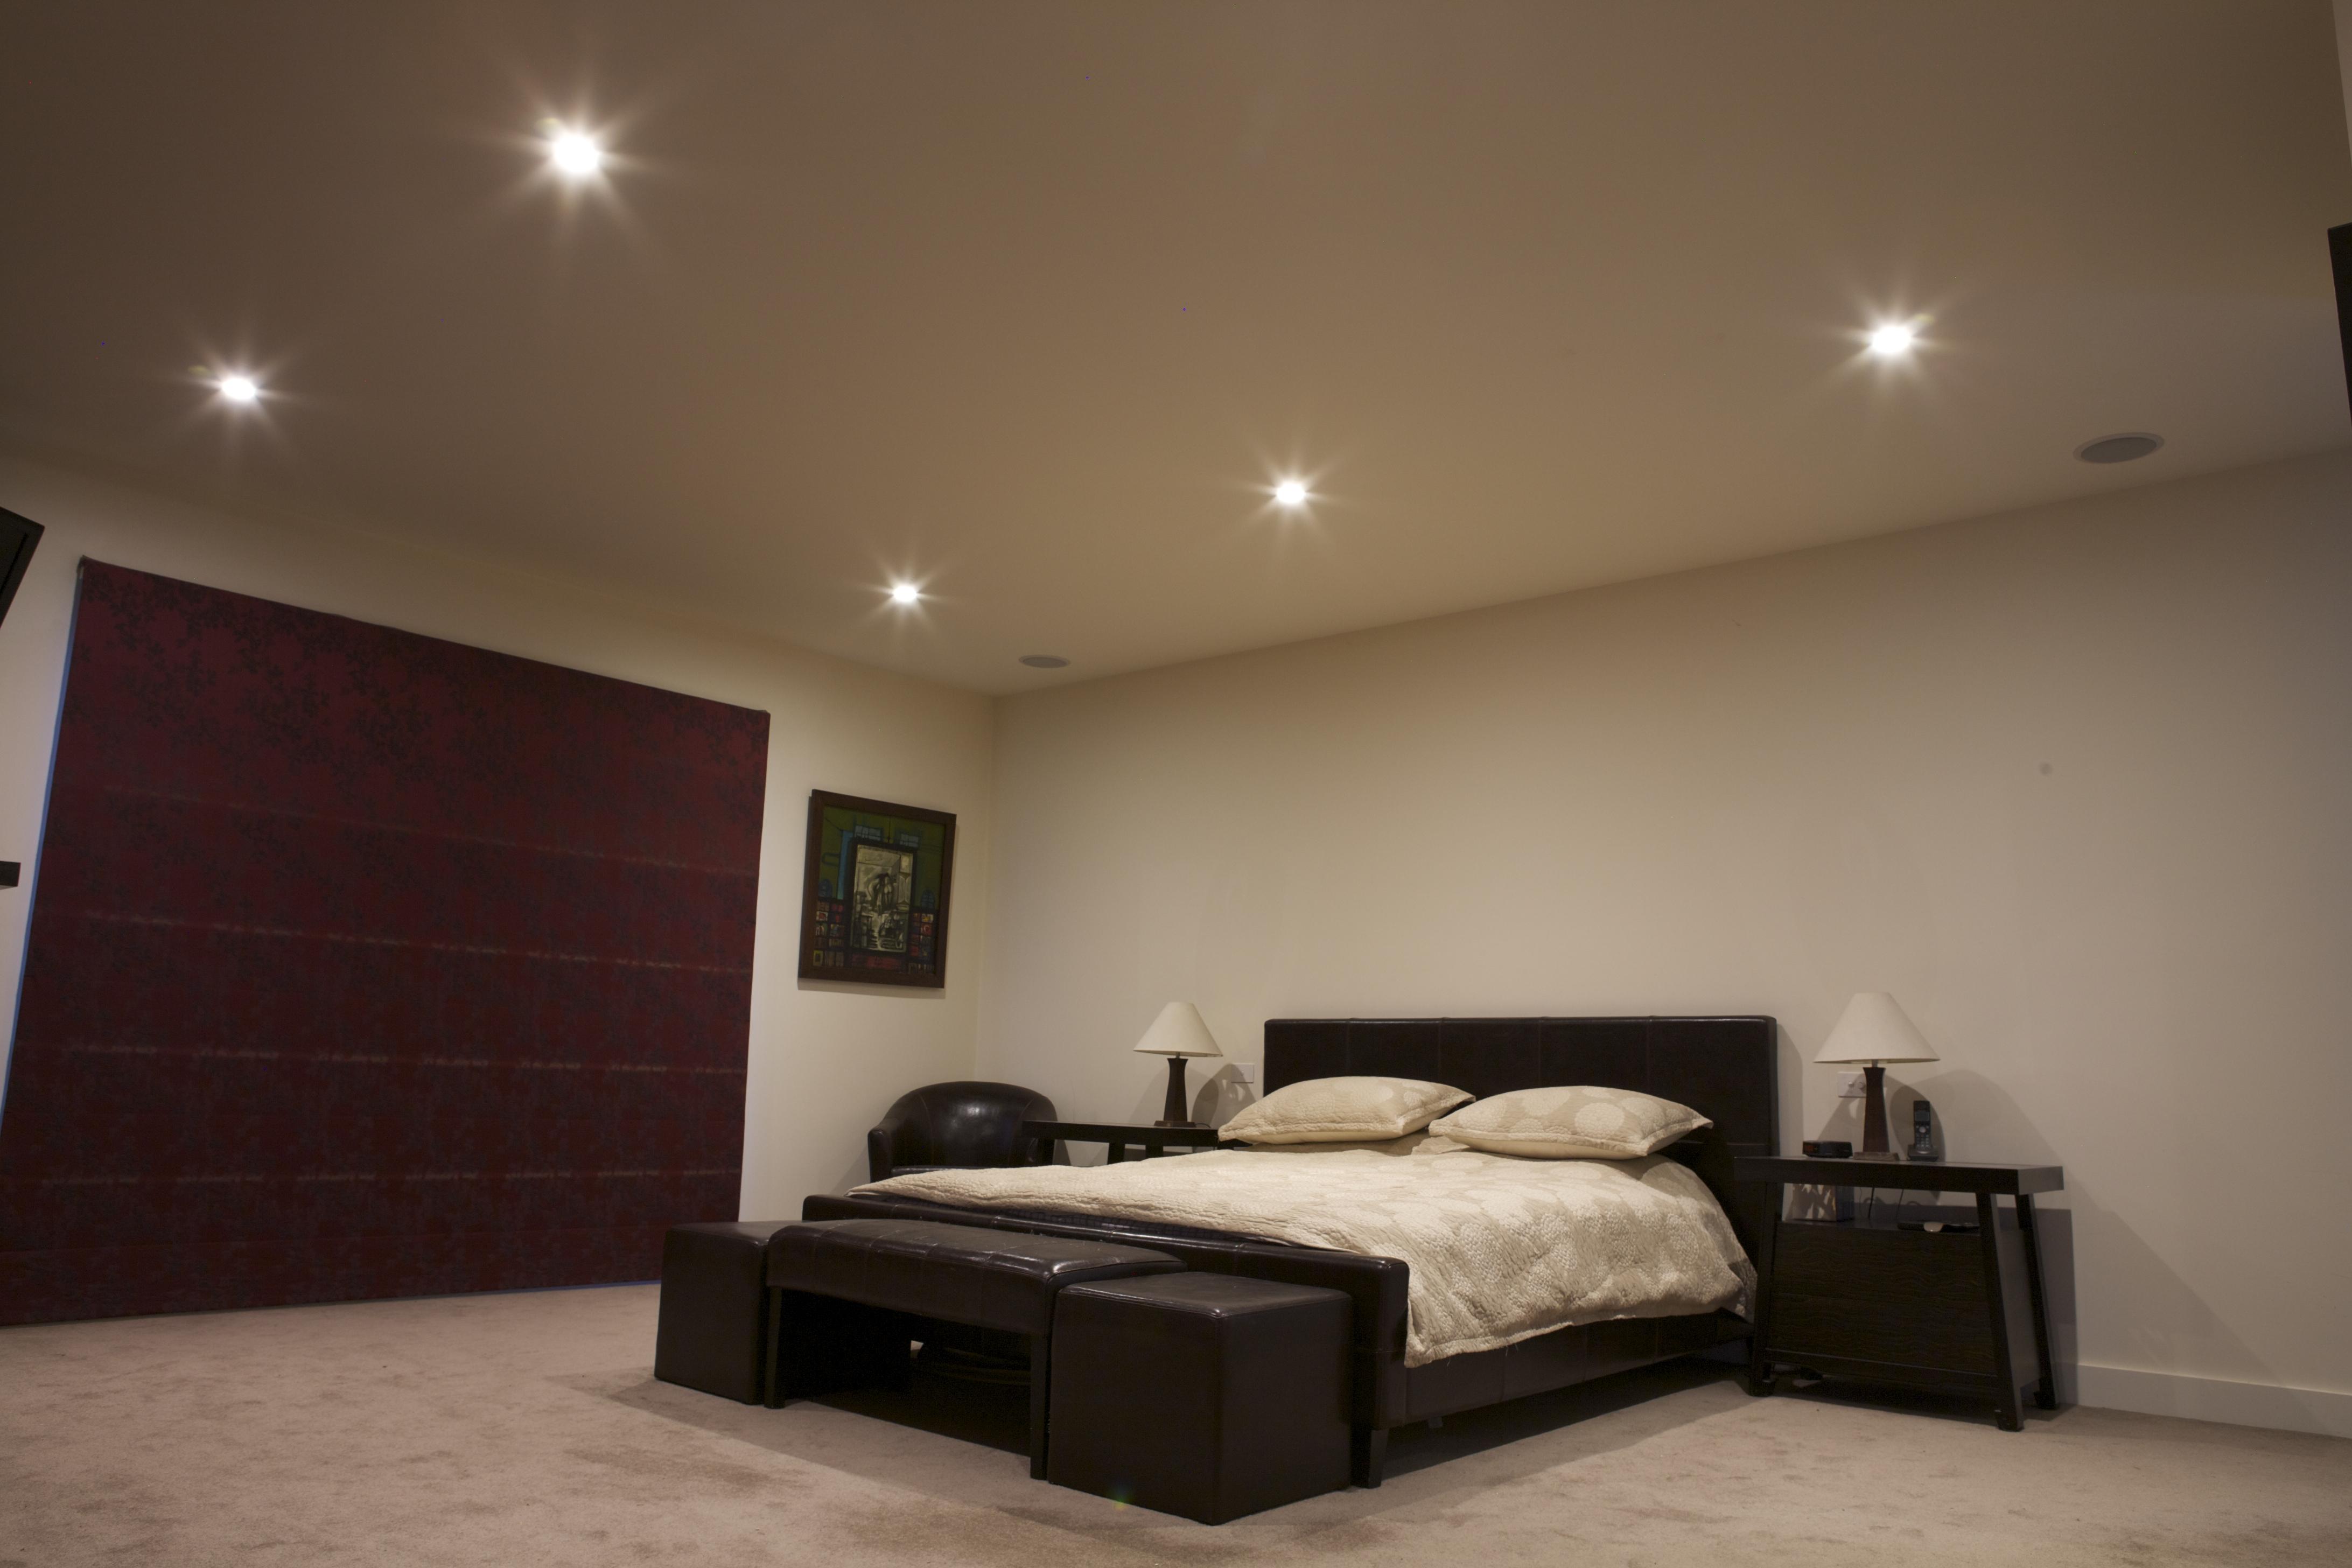 70mm or 90mm Downlights? Choosing LED lights